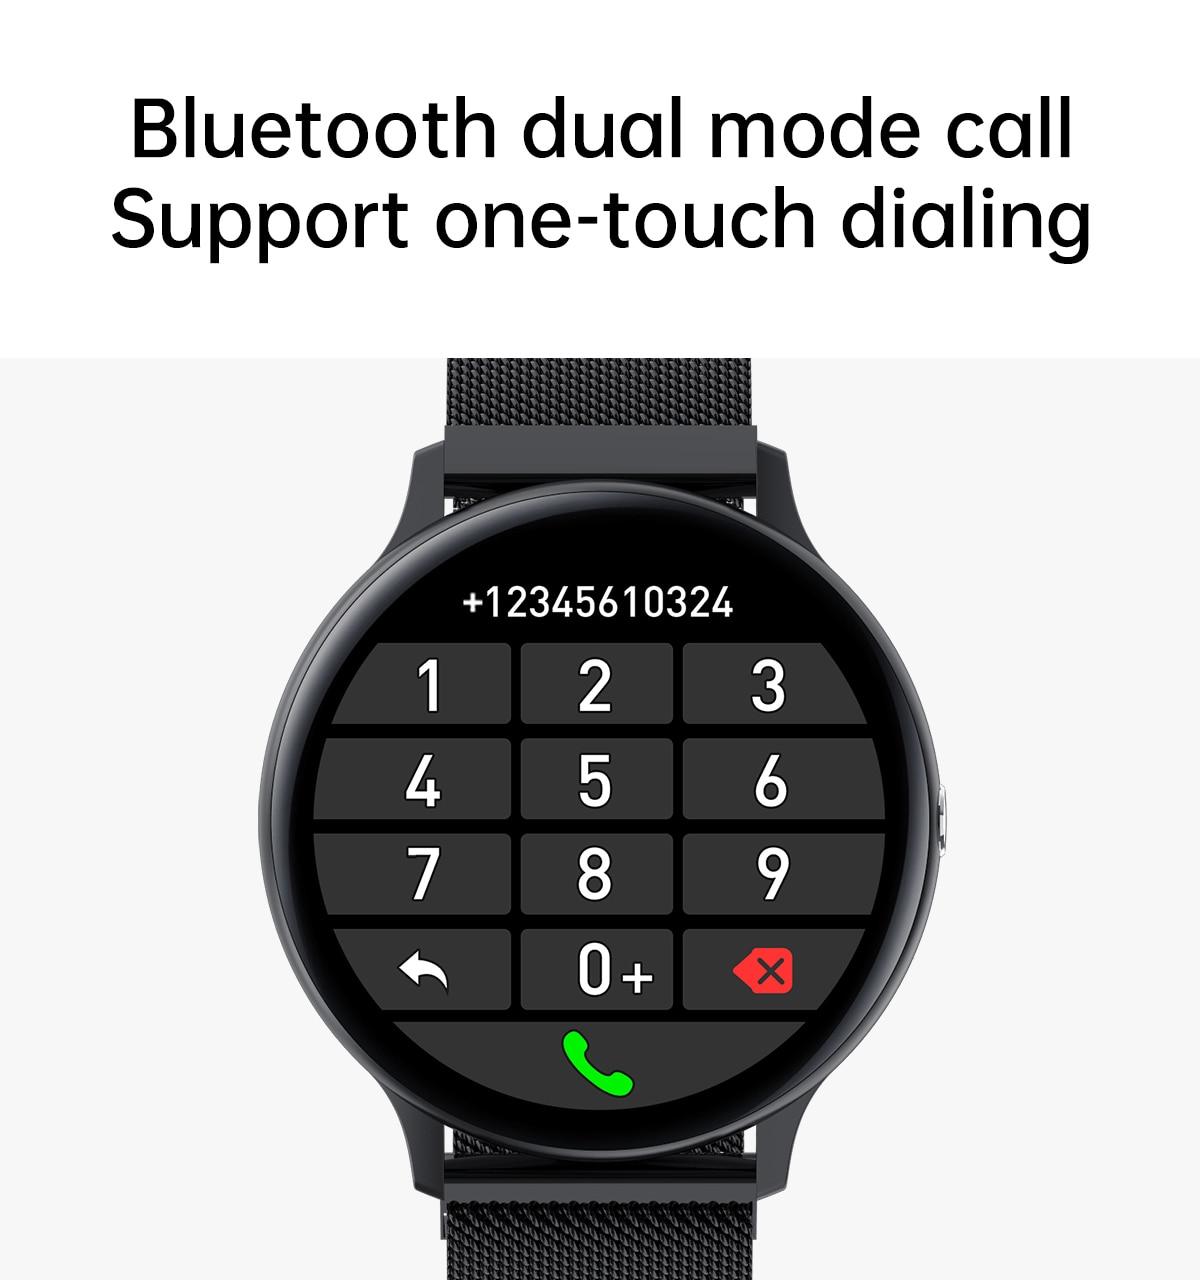 H8f5856363f094162849cdf9b13eedfcep LIGE 2021 New Bluetooth call smart watch men women Sport mode Heart rate and blood pressure monitor Activity tracker Smartwatch